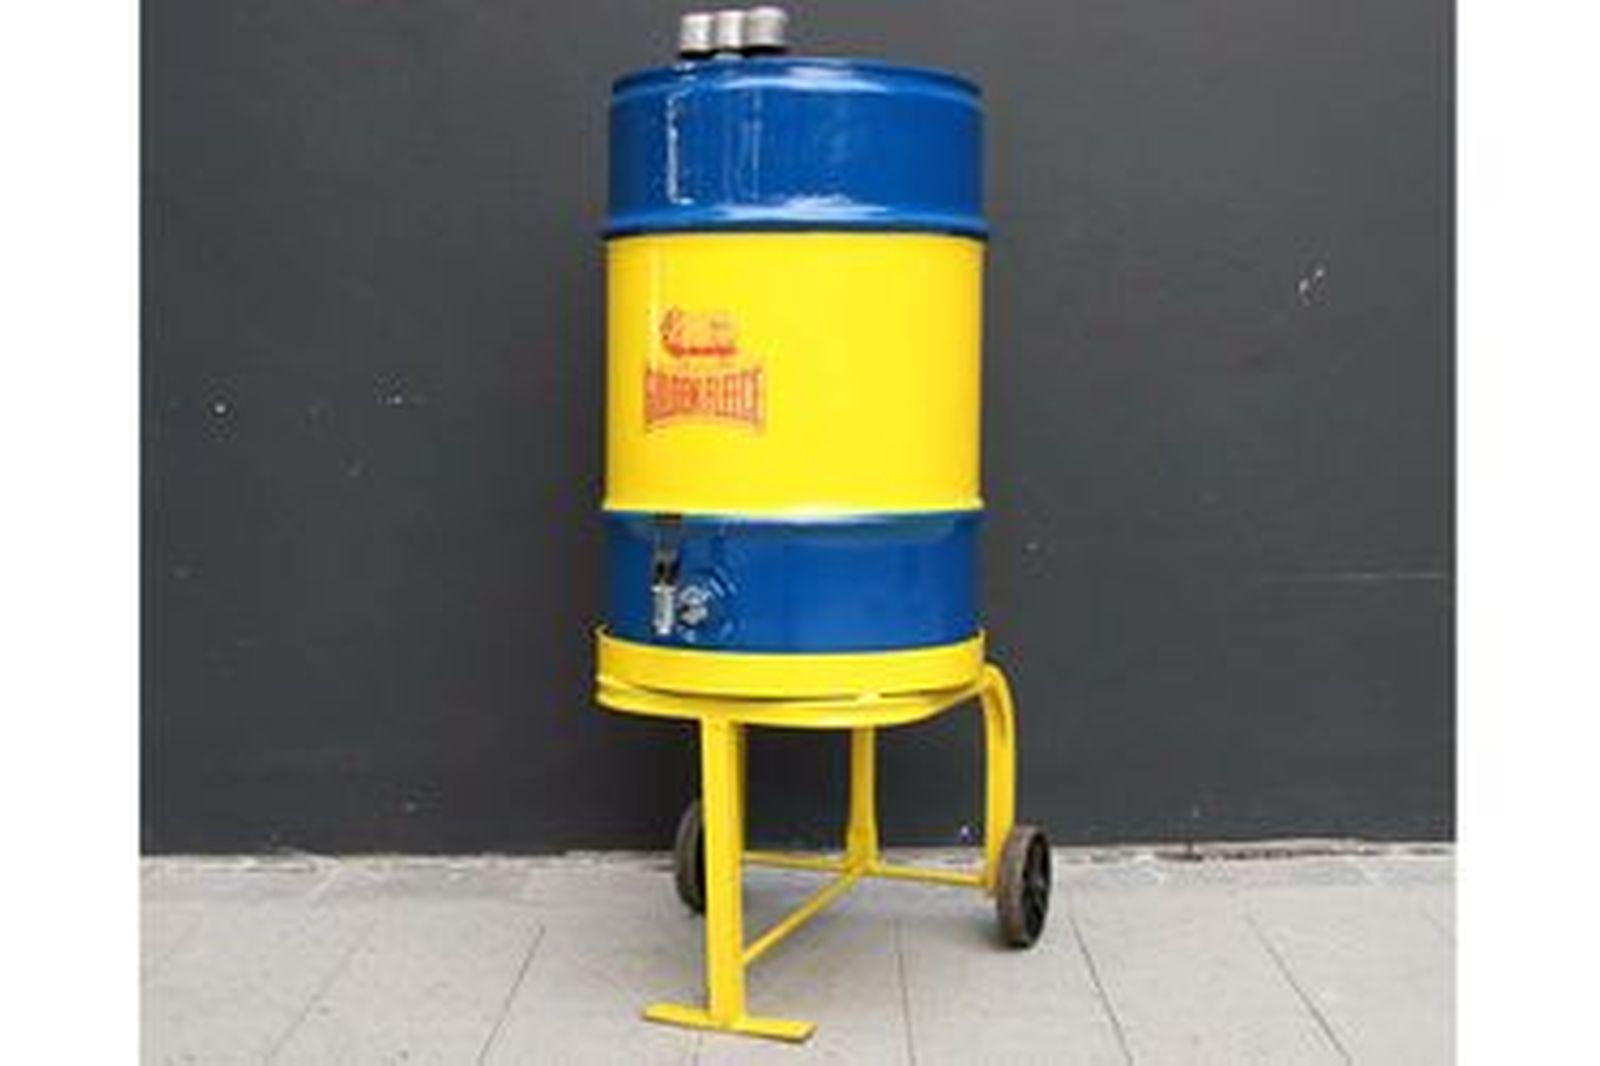 Golden Fleece Oil Drum on Trolley